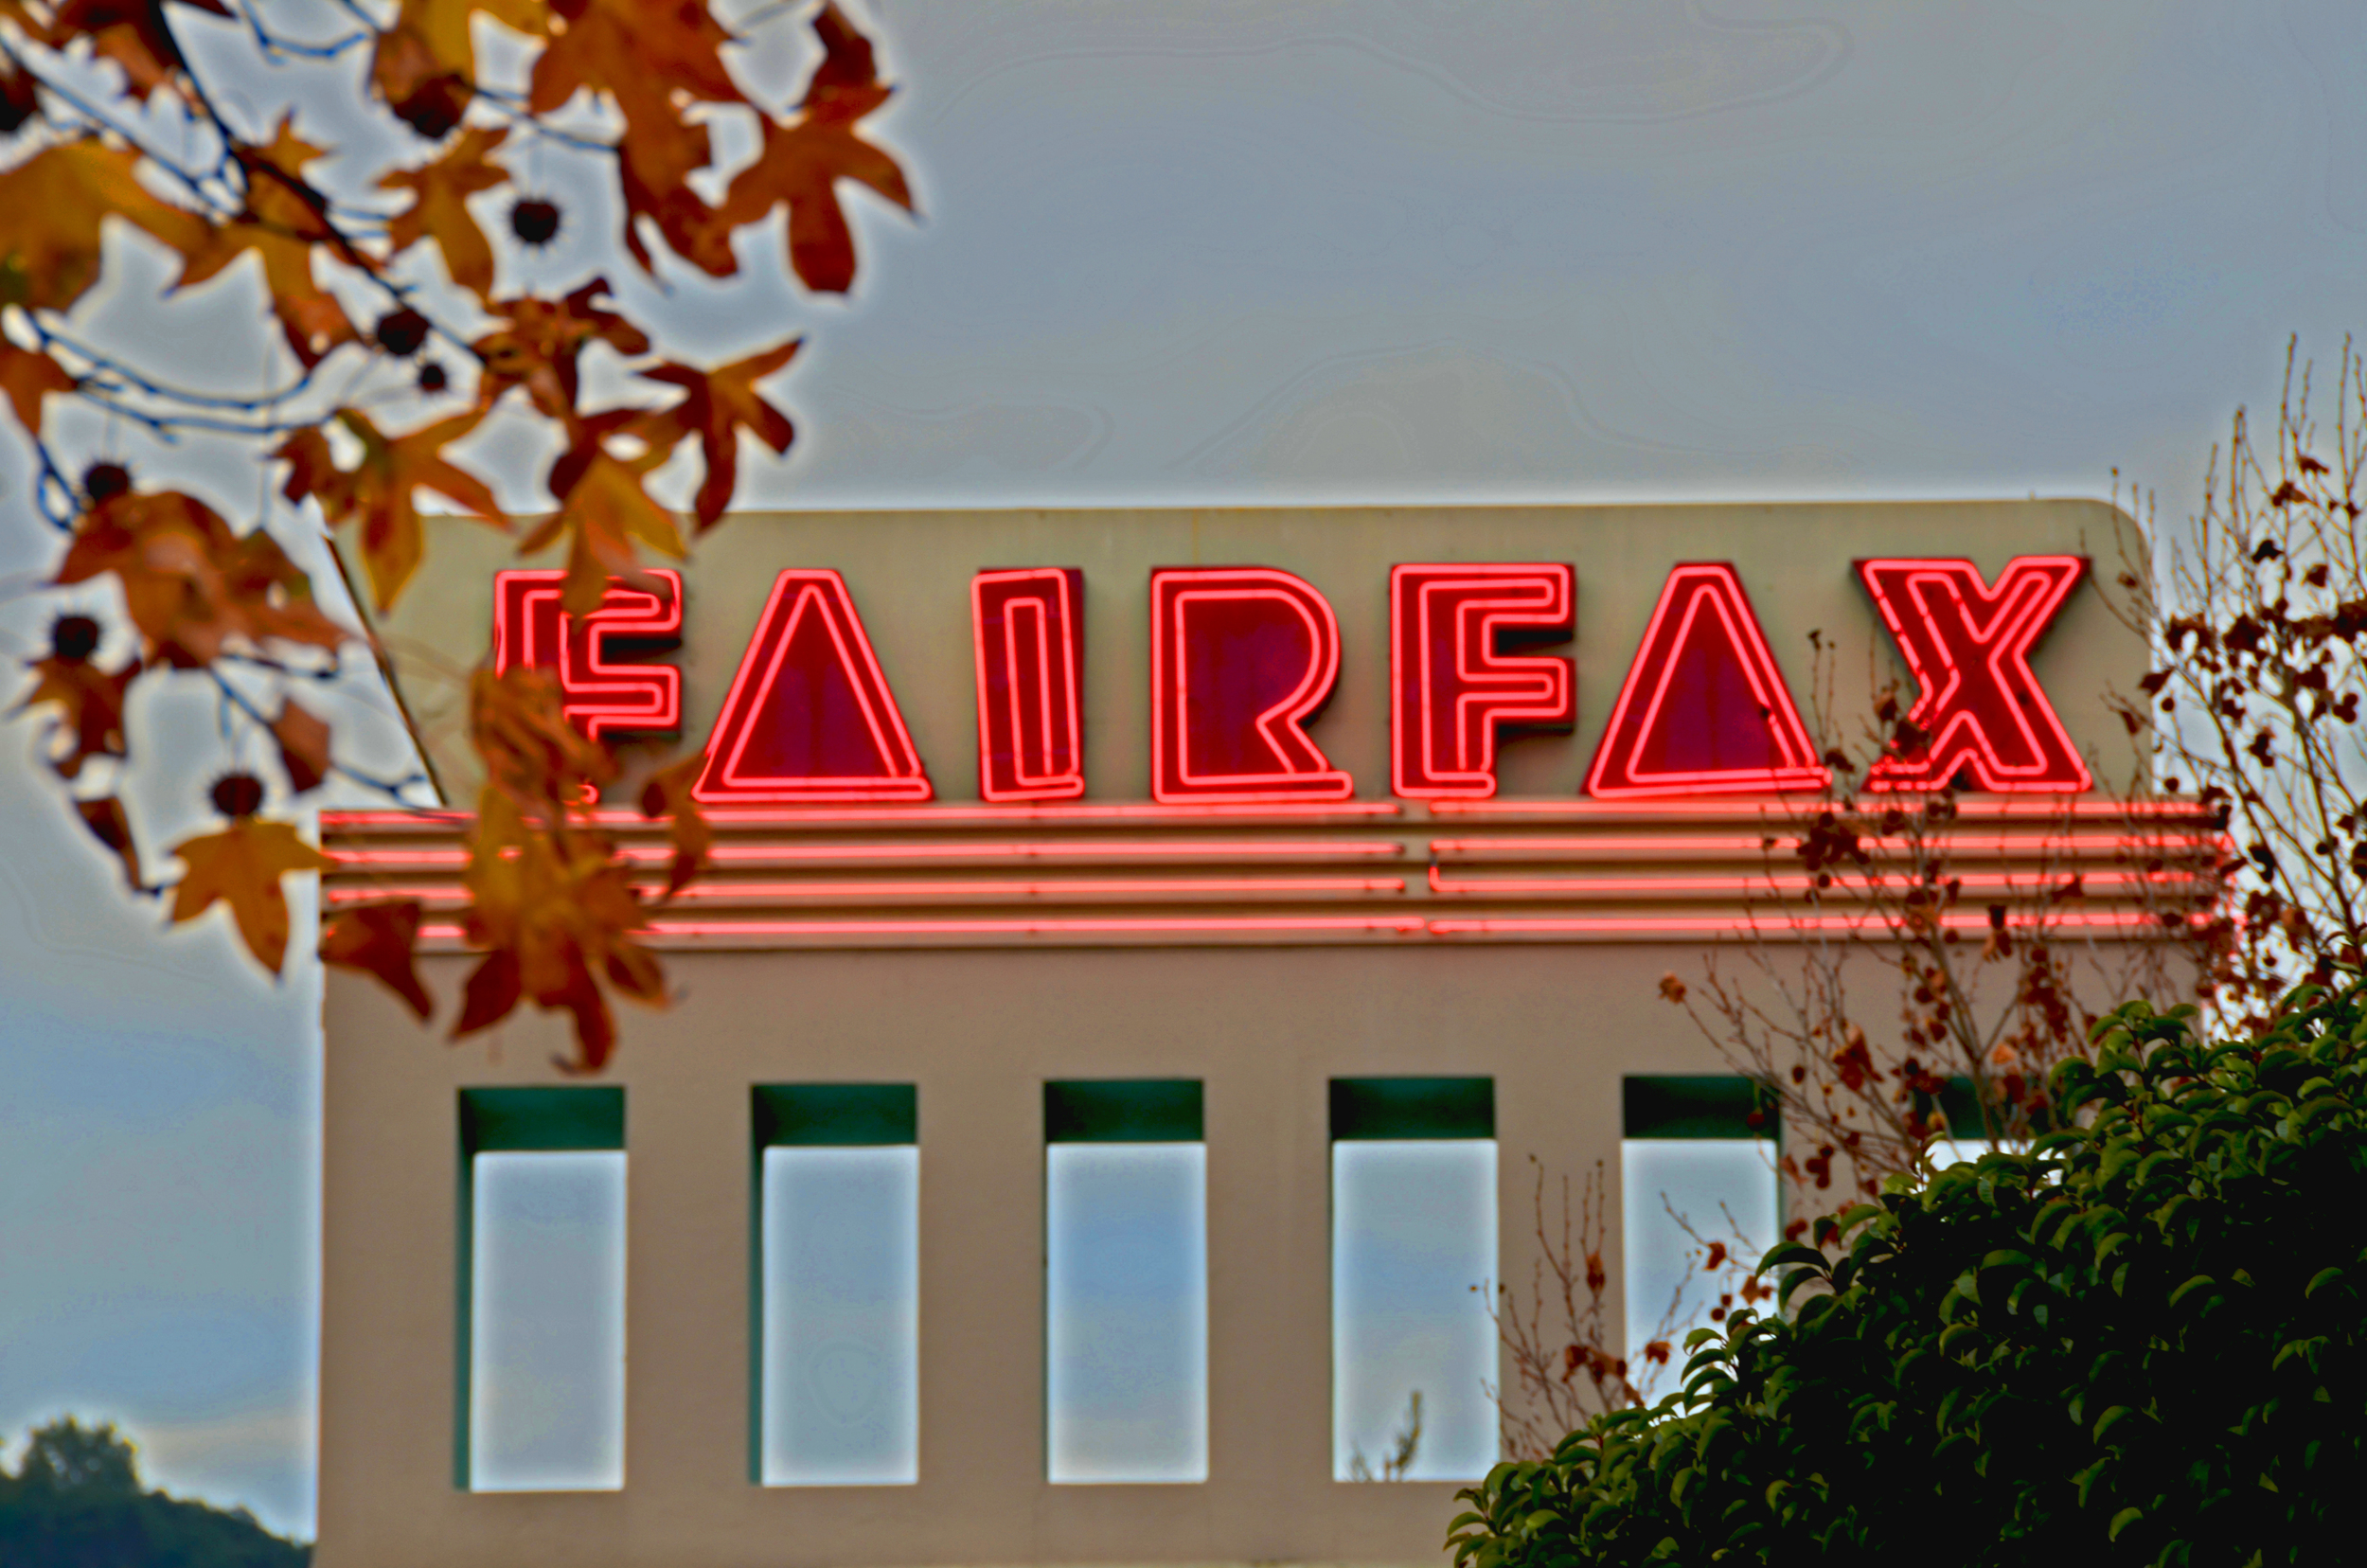 fairfaxsign_fall2013.jpg